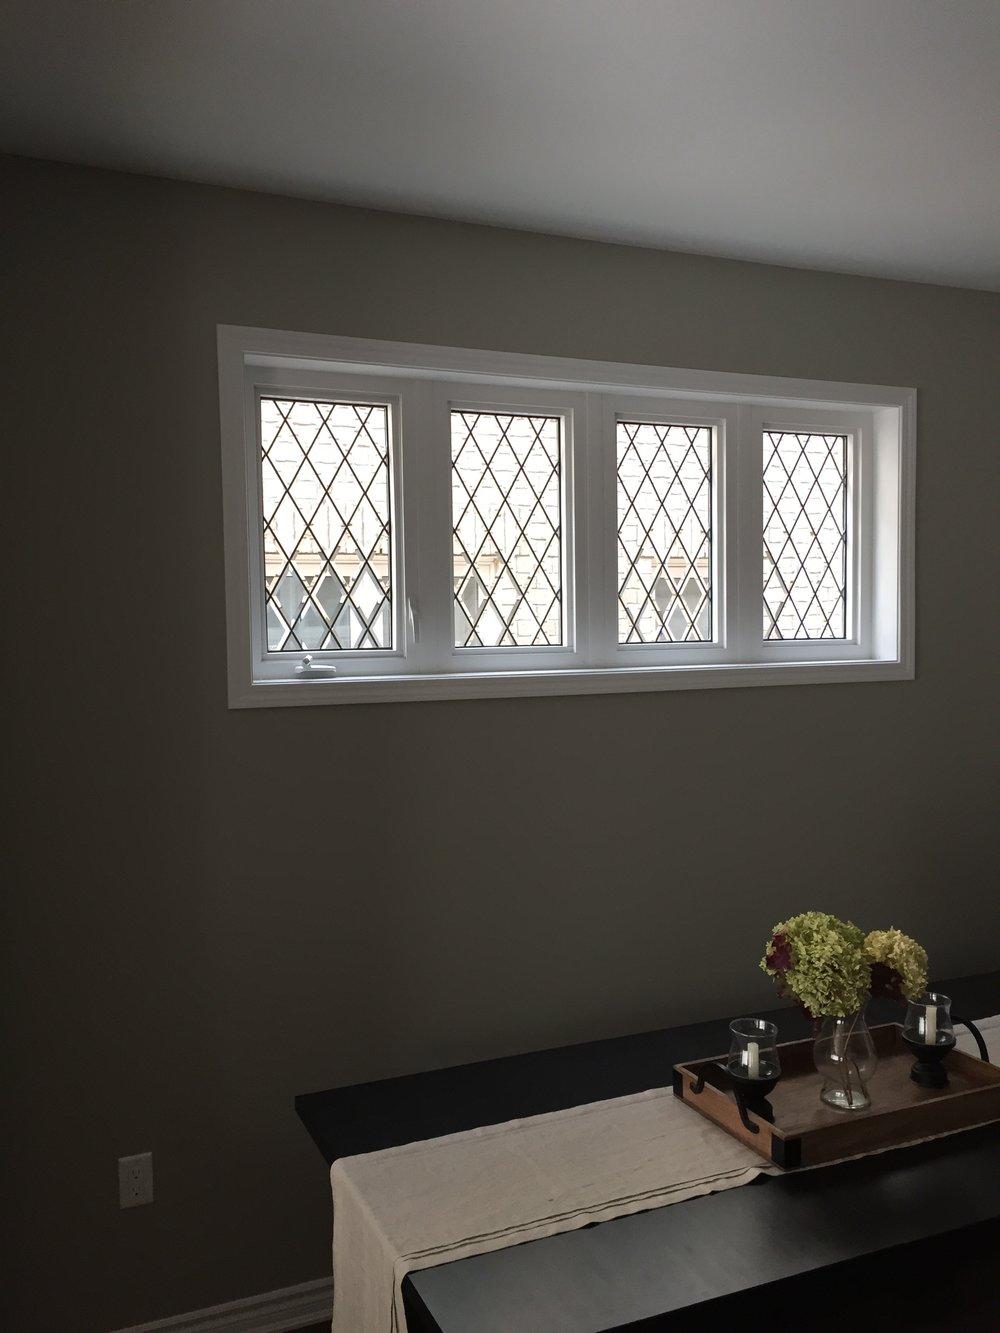 Cookstown-Decorative-Glass-Door-Inserts-Aurora-Ontario